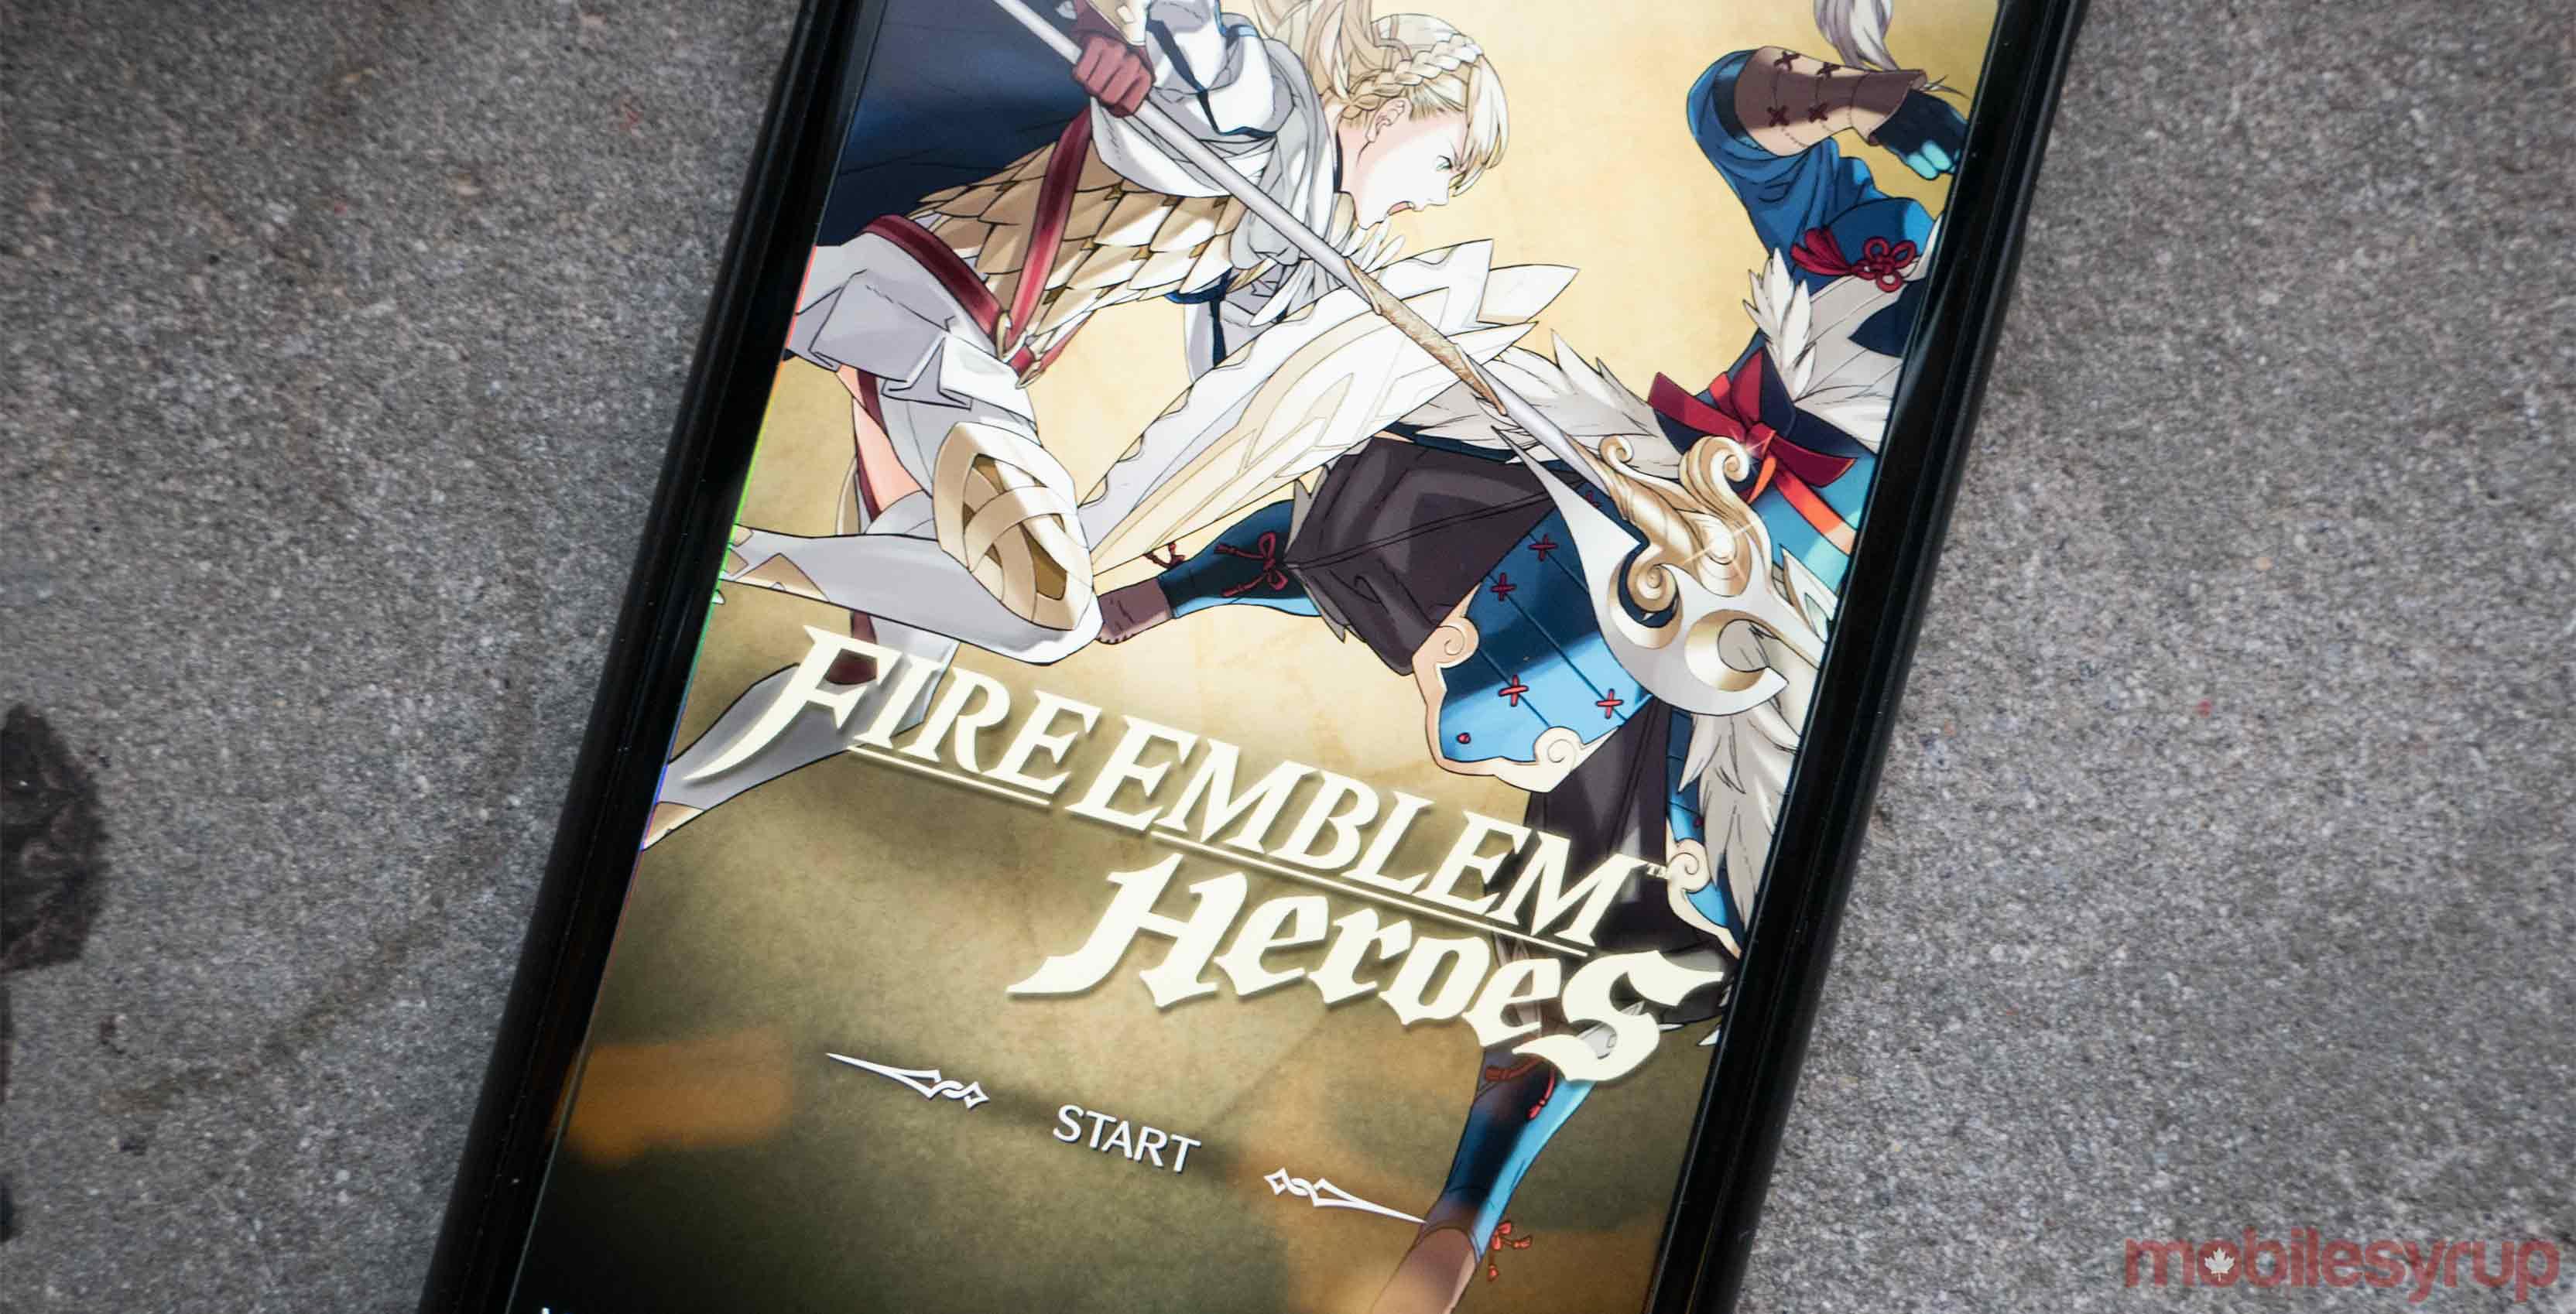 Fire Emblem Heroes on phone